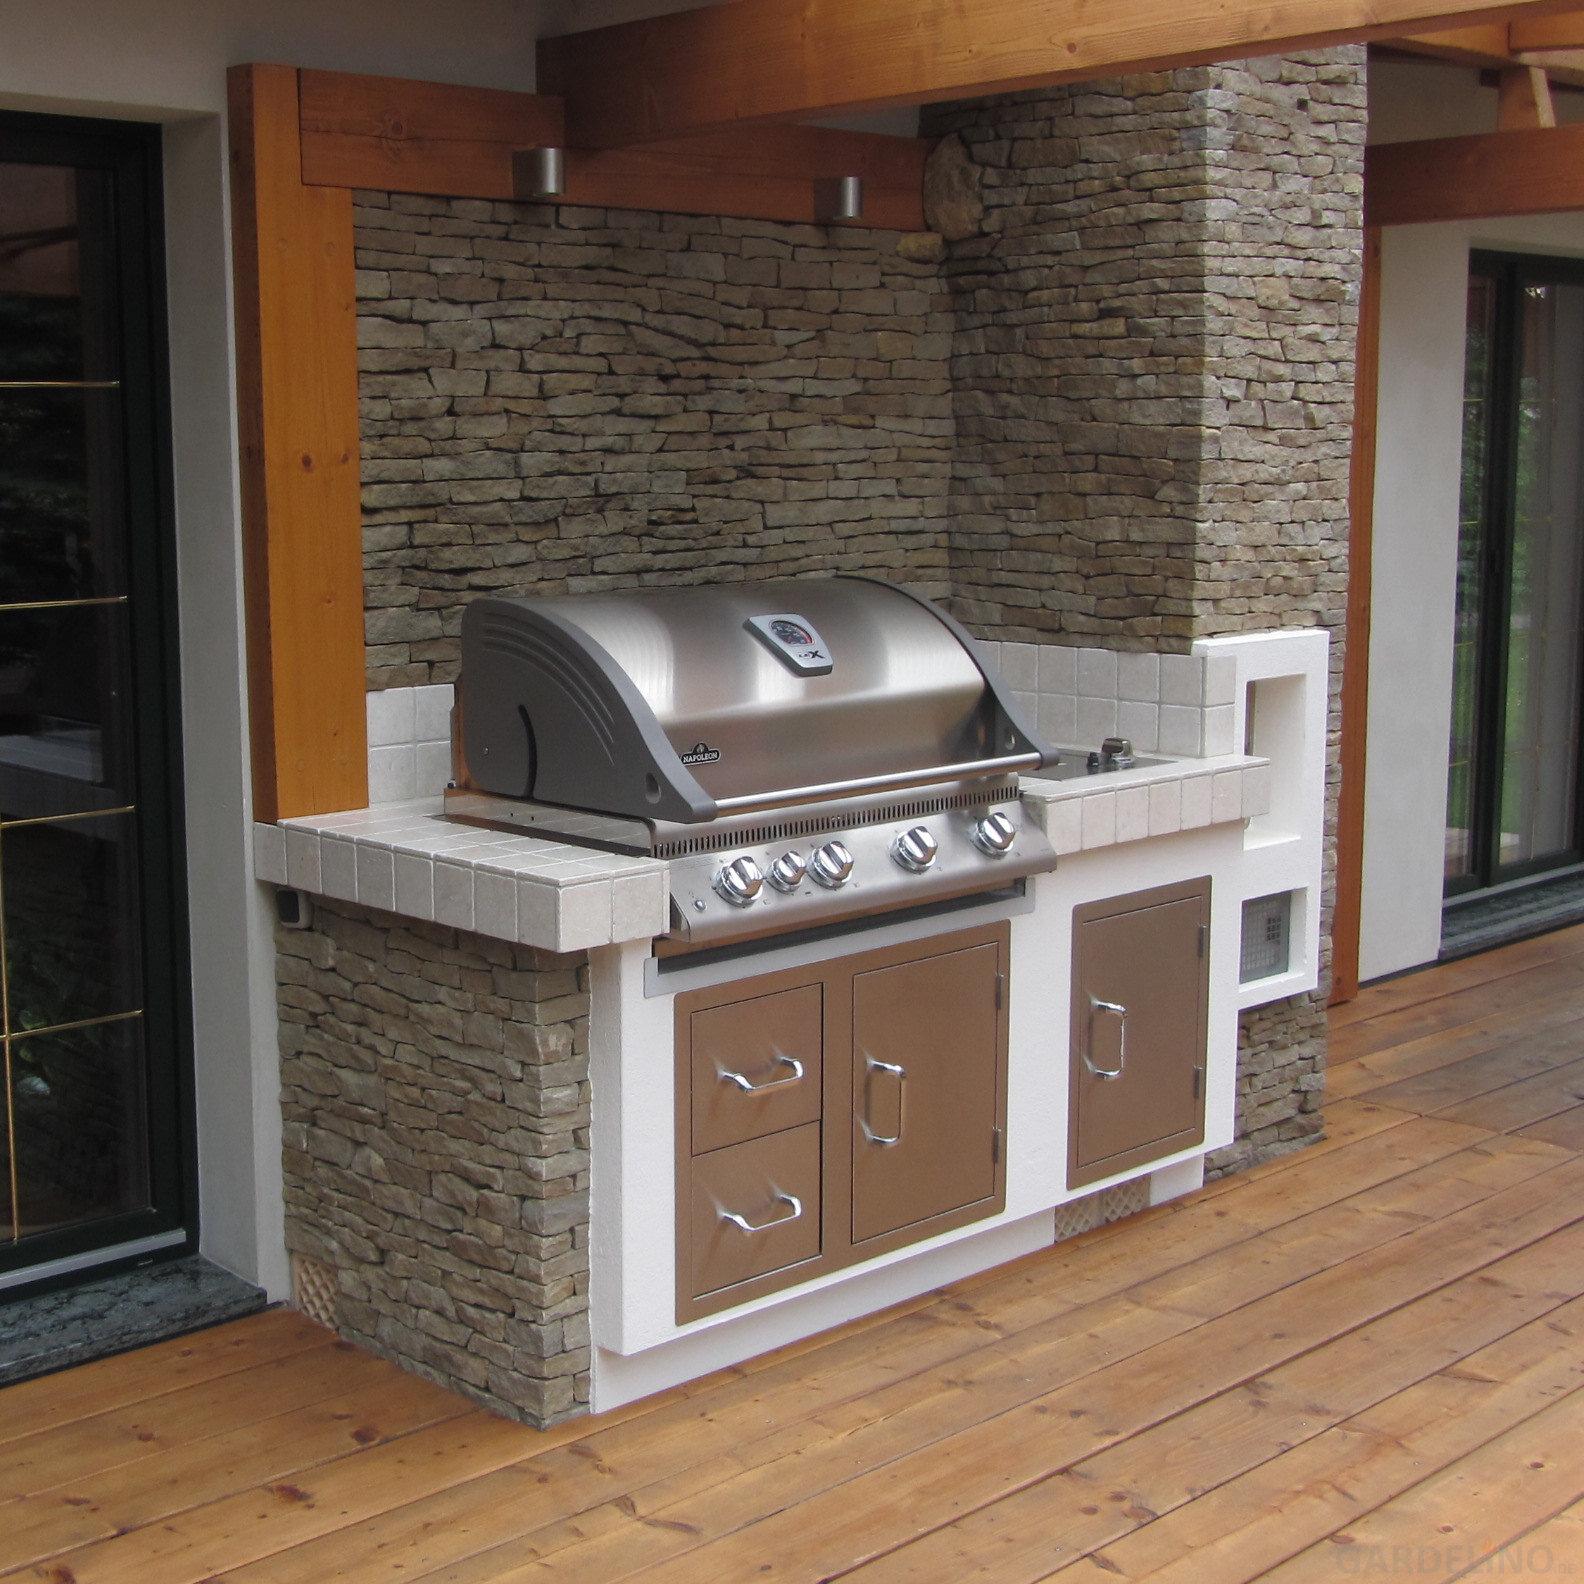 selbstgebaute au enk che mit napoleon grill. Black Bedroom Furniture Sets. Home Design Ideas